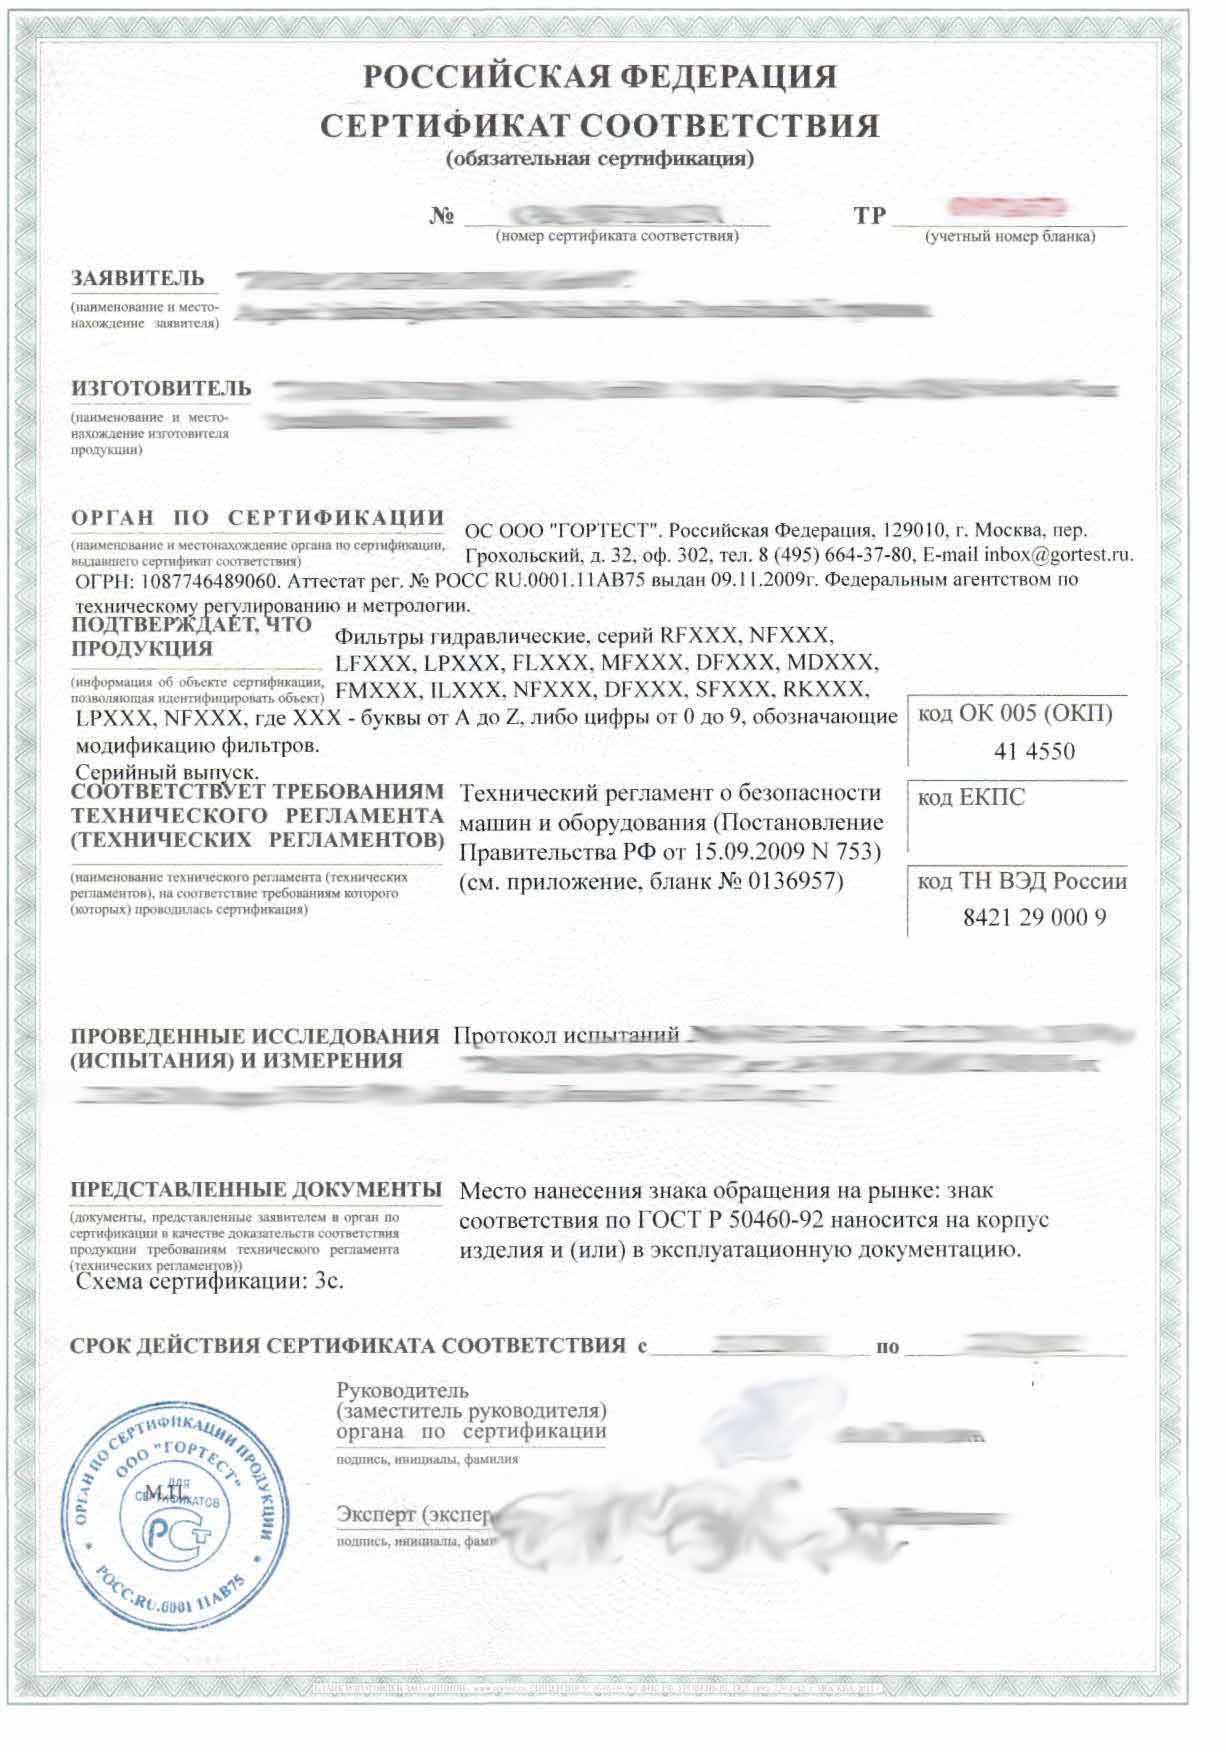 Сертификат соответствия на технический регламент.